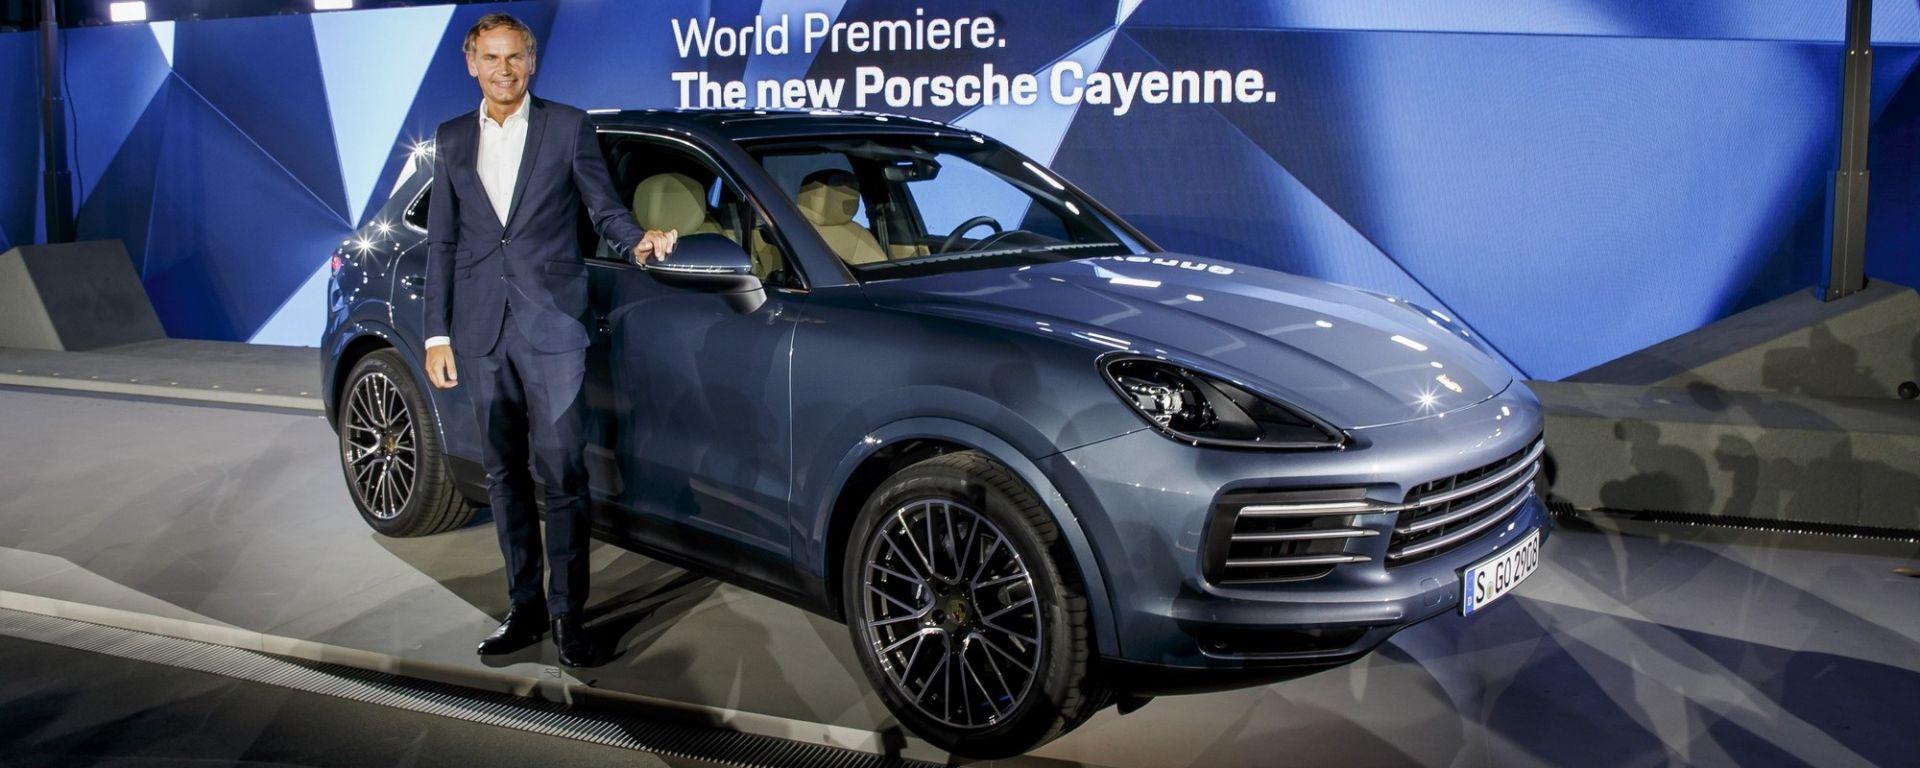 Nuova Porsche Cayenne 2018 introdotta da Oliver Blume